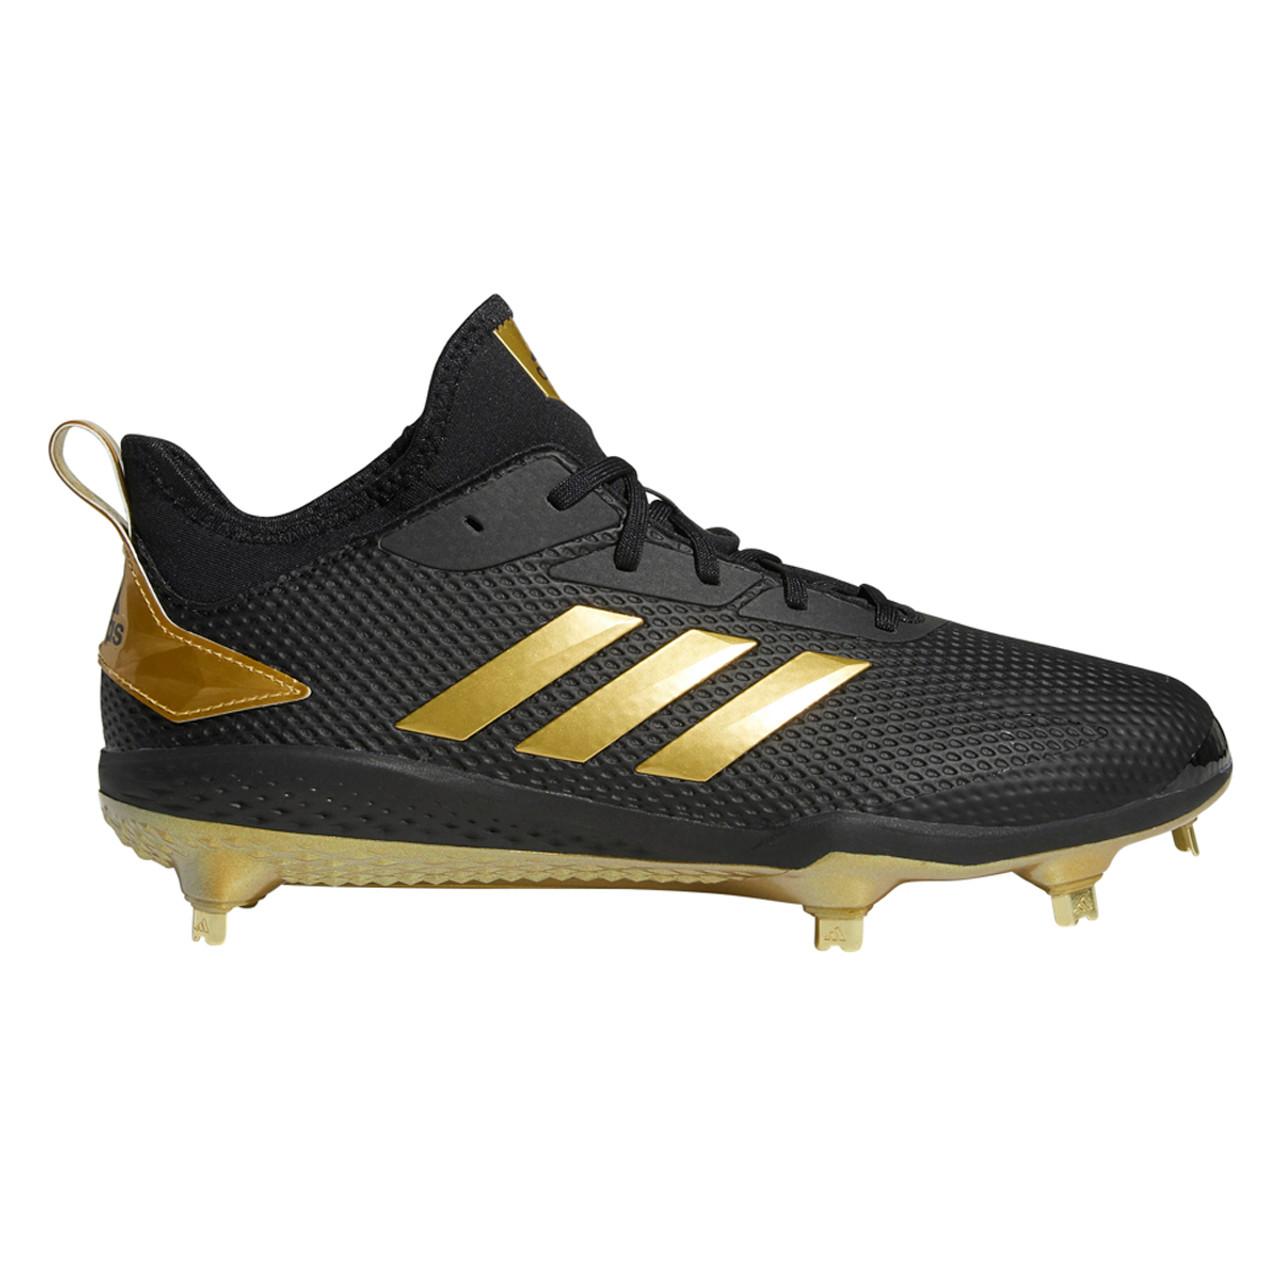 sports shoes 39b56 fa61a Adidas Adizero Afterburner V Mens Baseball Cleats CG5223 ...